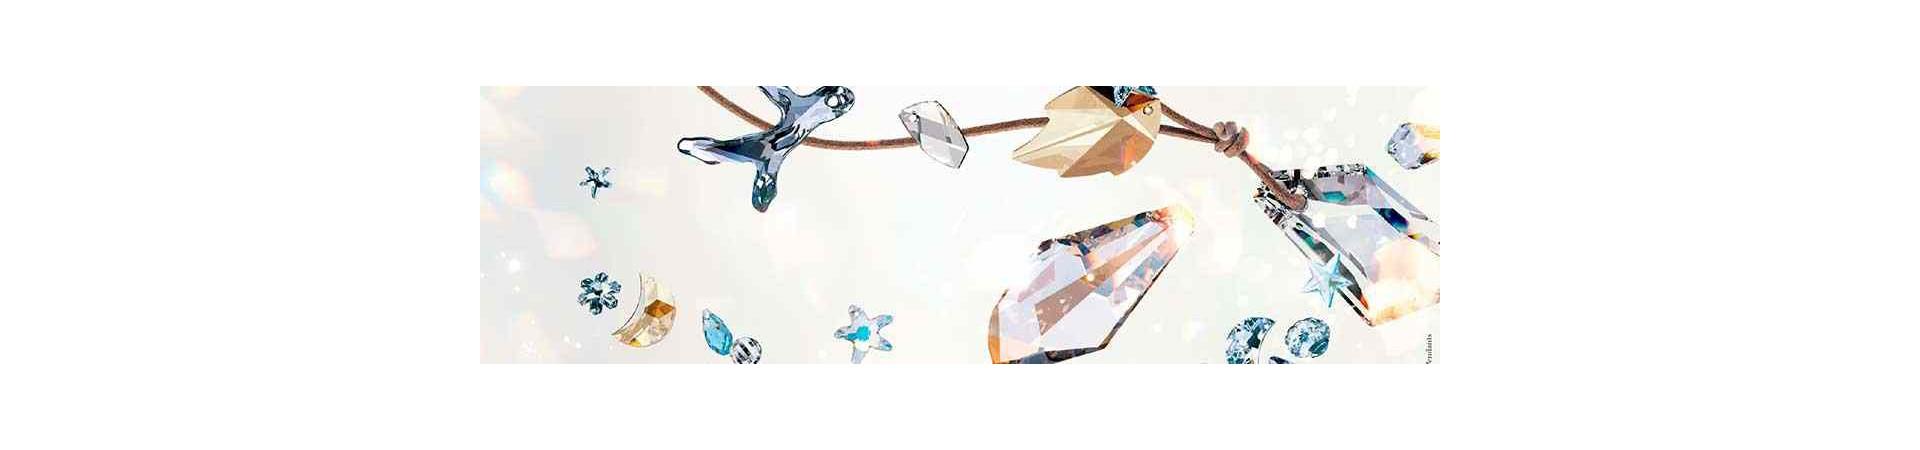 Кристаллические Подвески